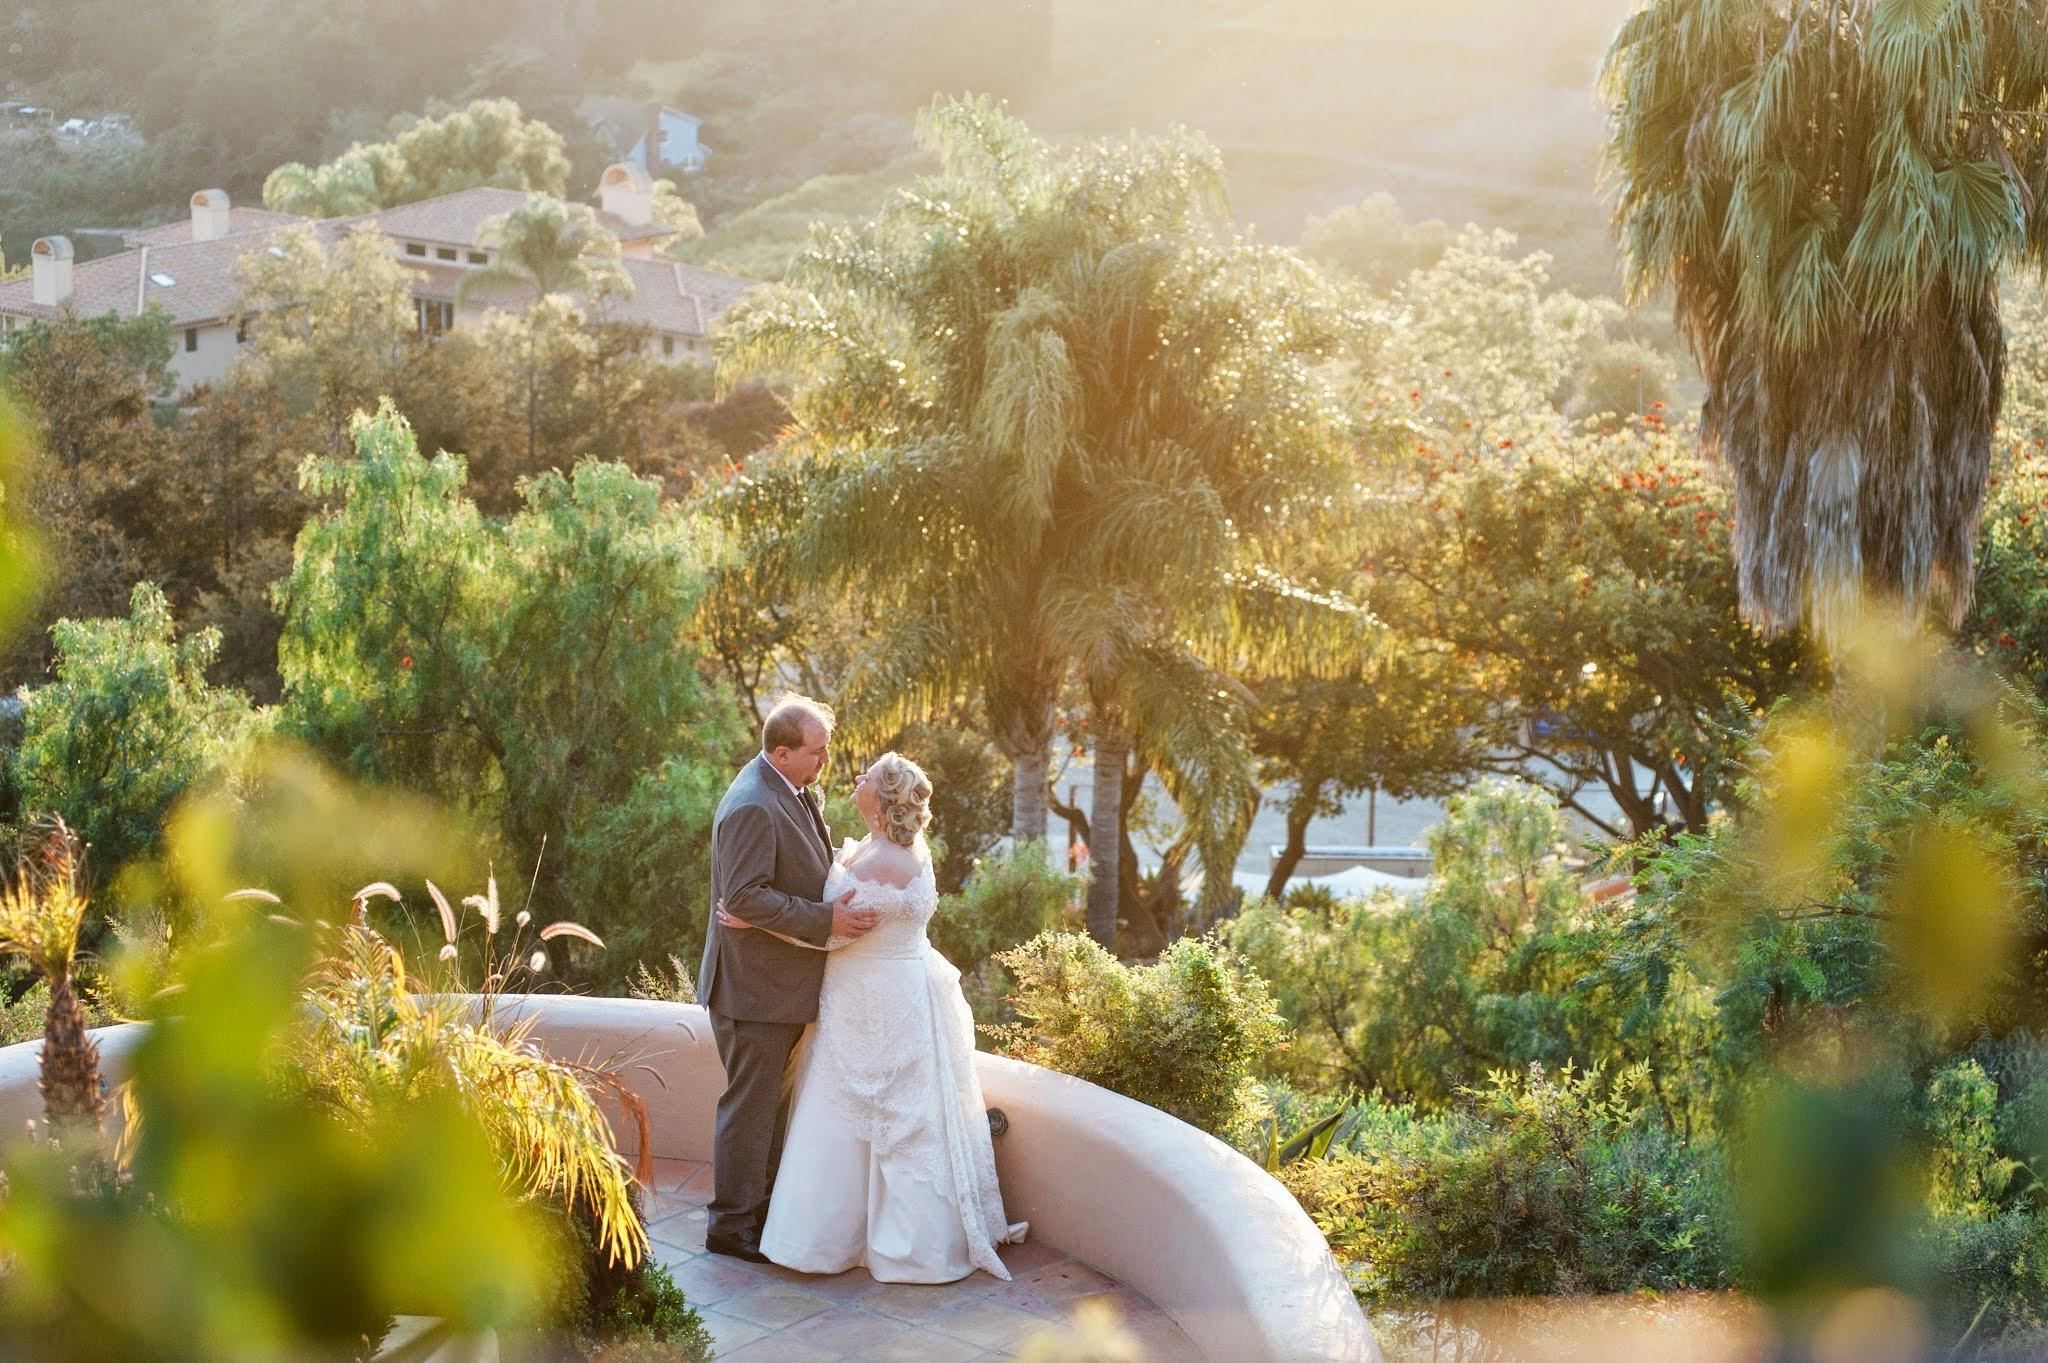 www.santabarbarawedding.com | Andrejka Photography | Villa Verano | Wedding Venue | Private Estate | Bride and Groom | Amazing Views